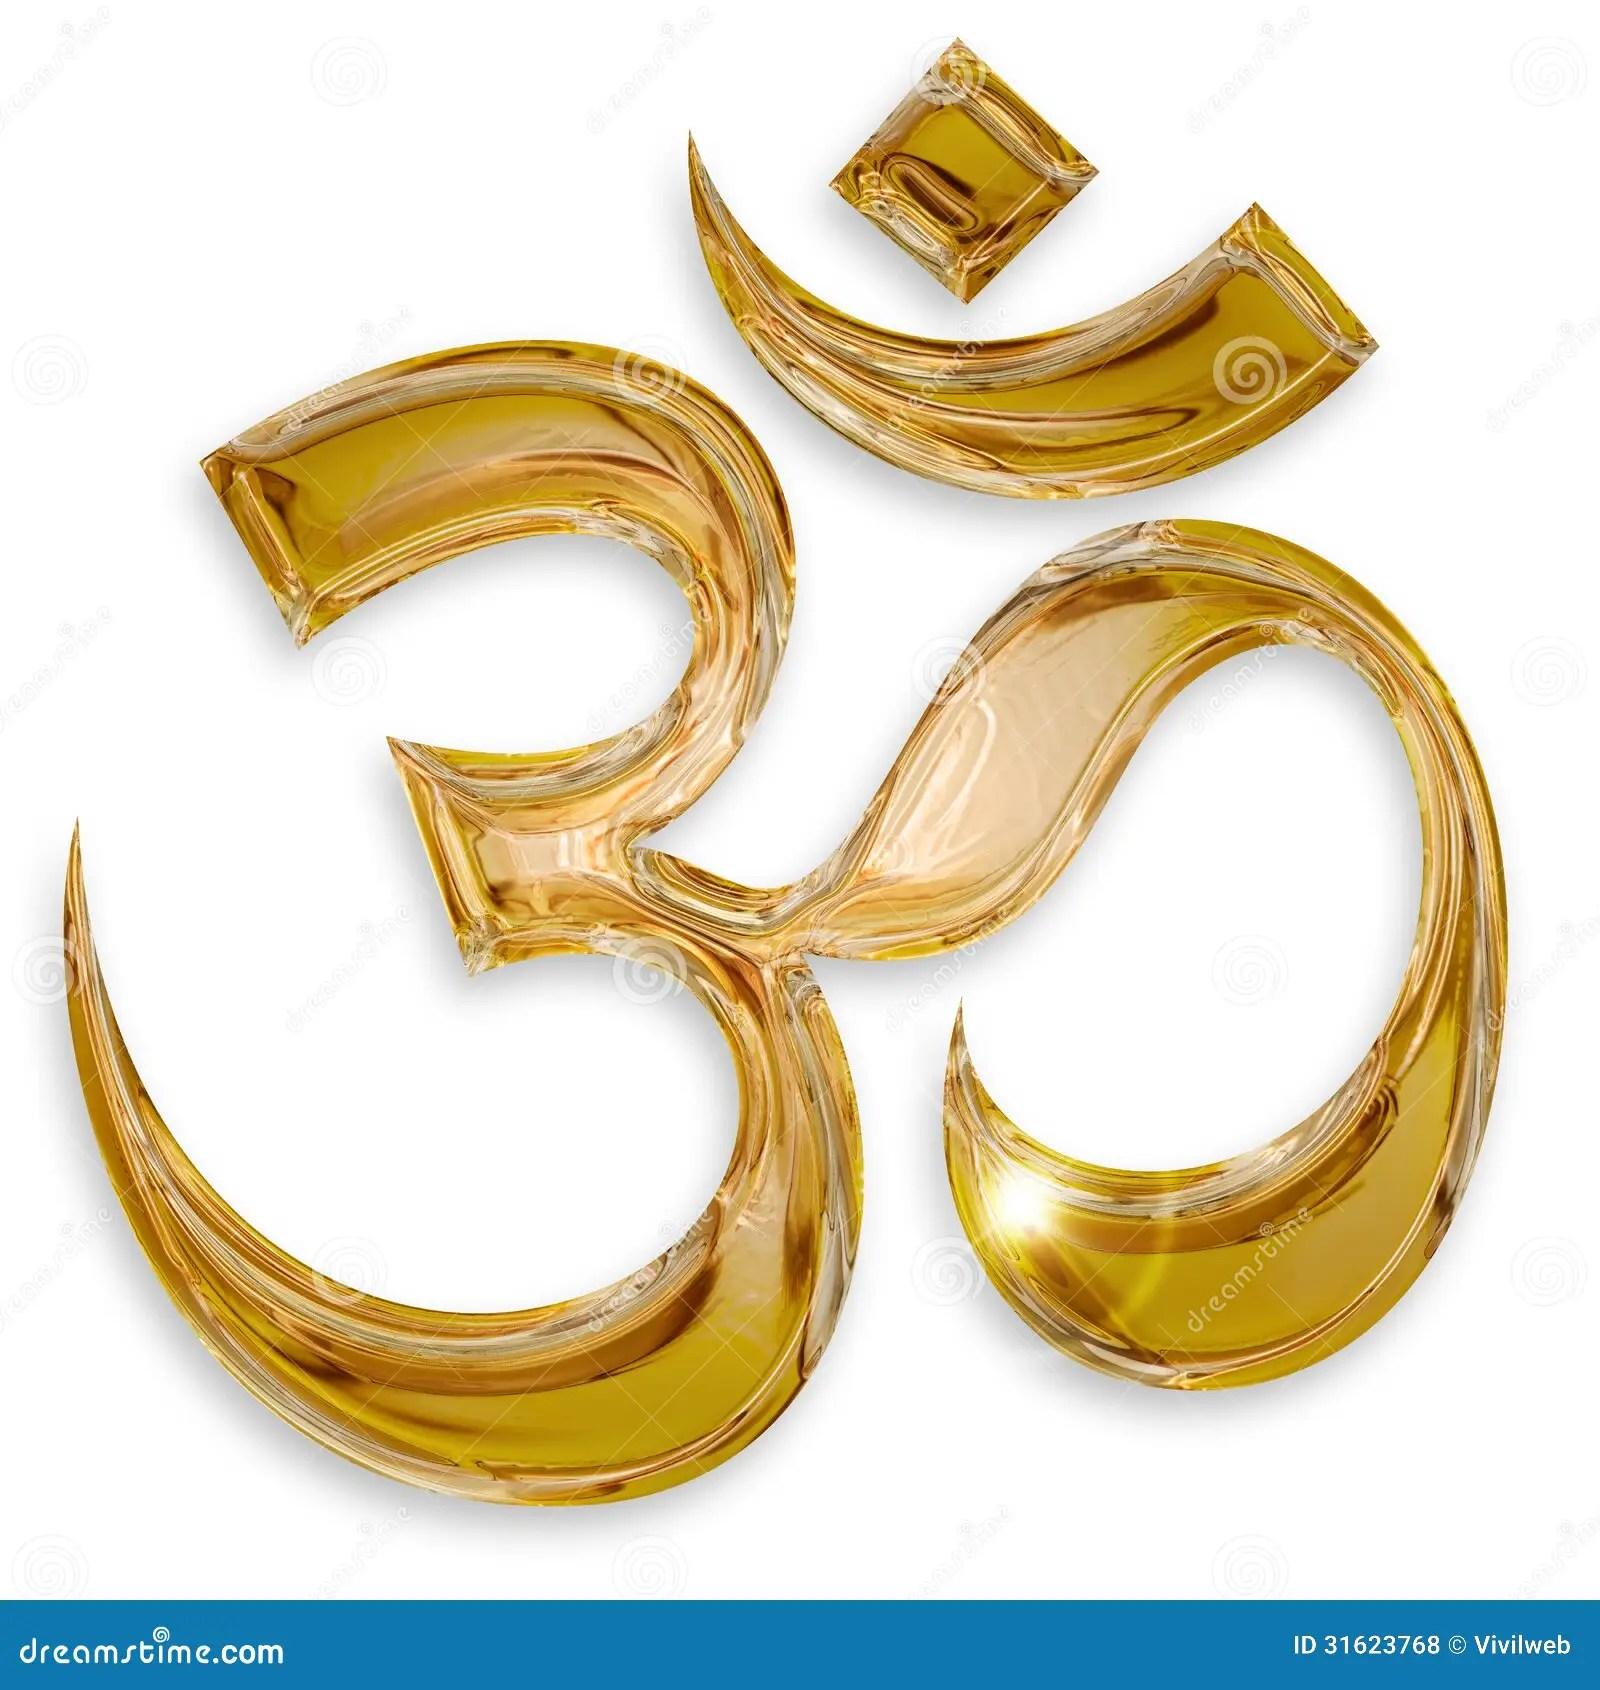 Religious symbols hinduism religious symbols biocorpaavc